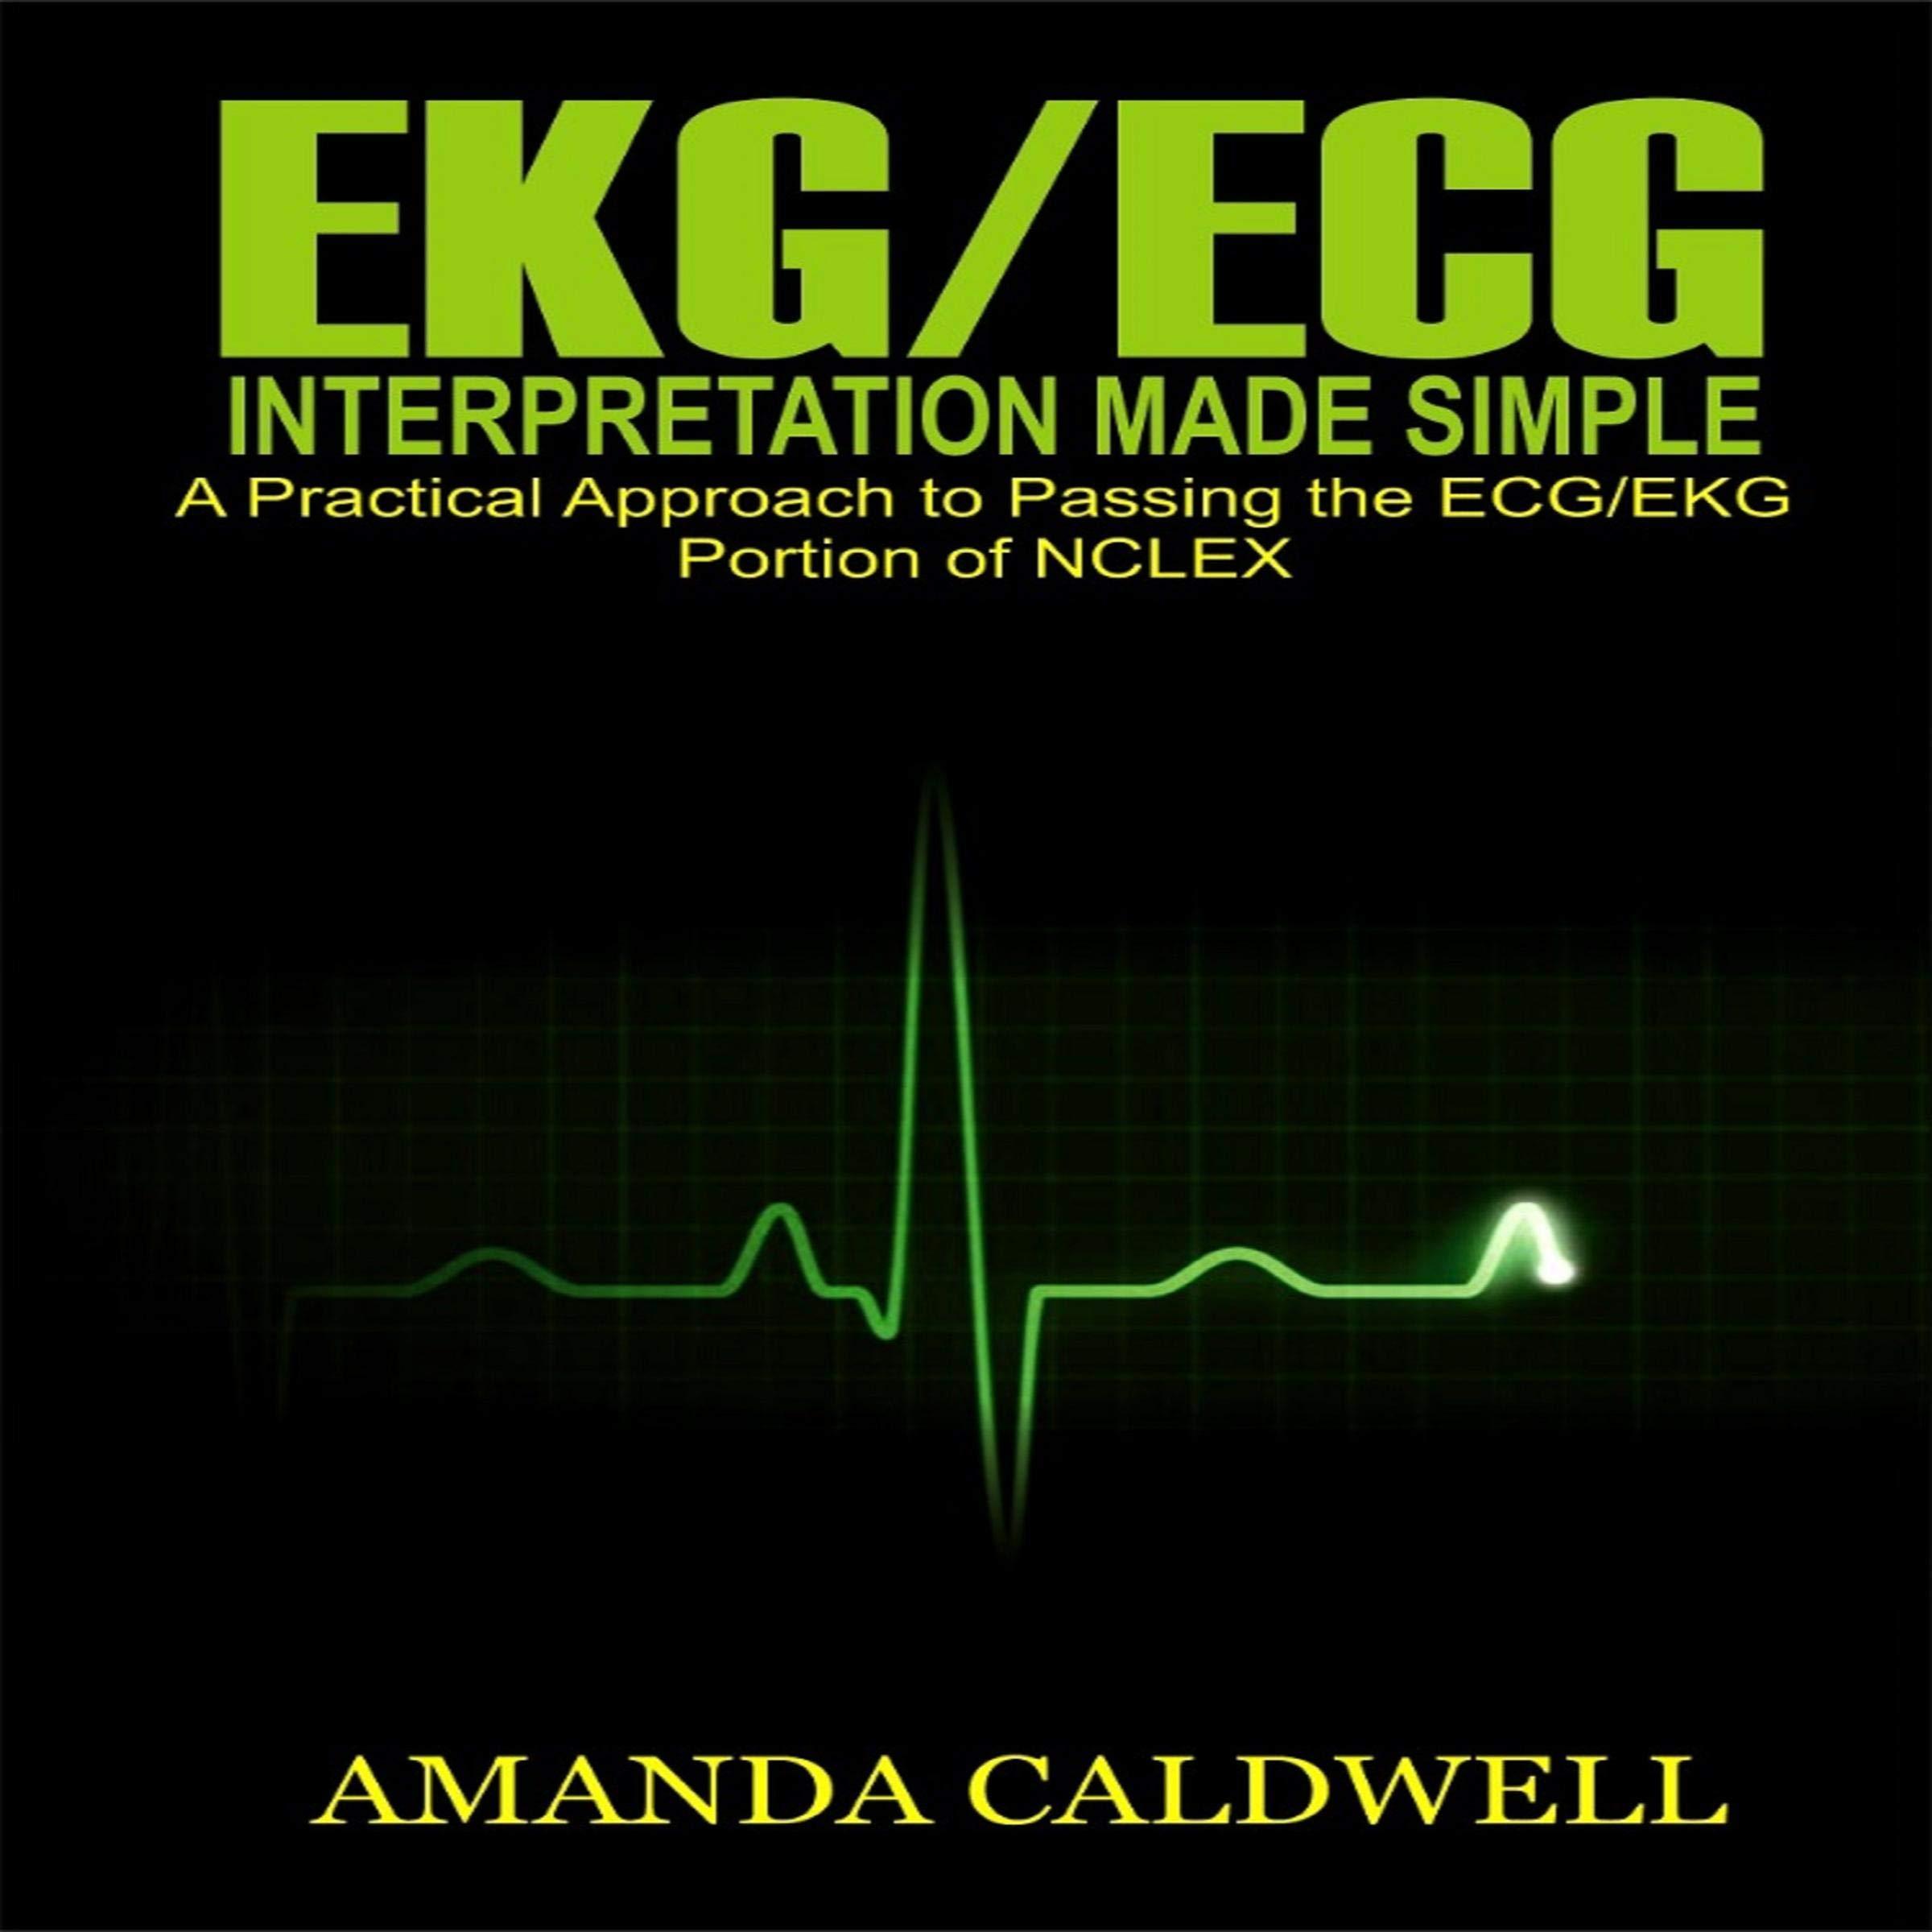 EKG ECG Interpretation Made Simple  A Practical Approach To Passing The ECG EKG Portion Of NCLEX